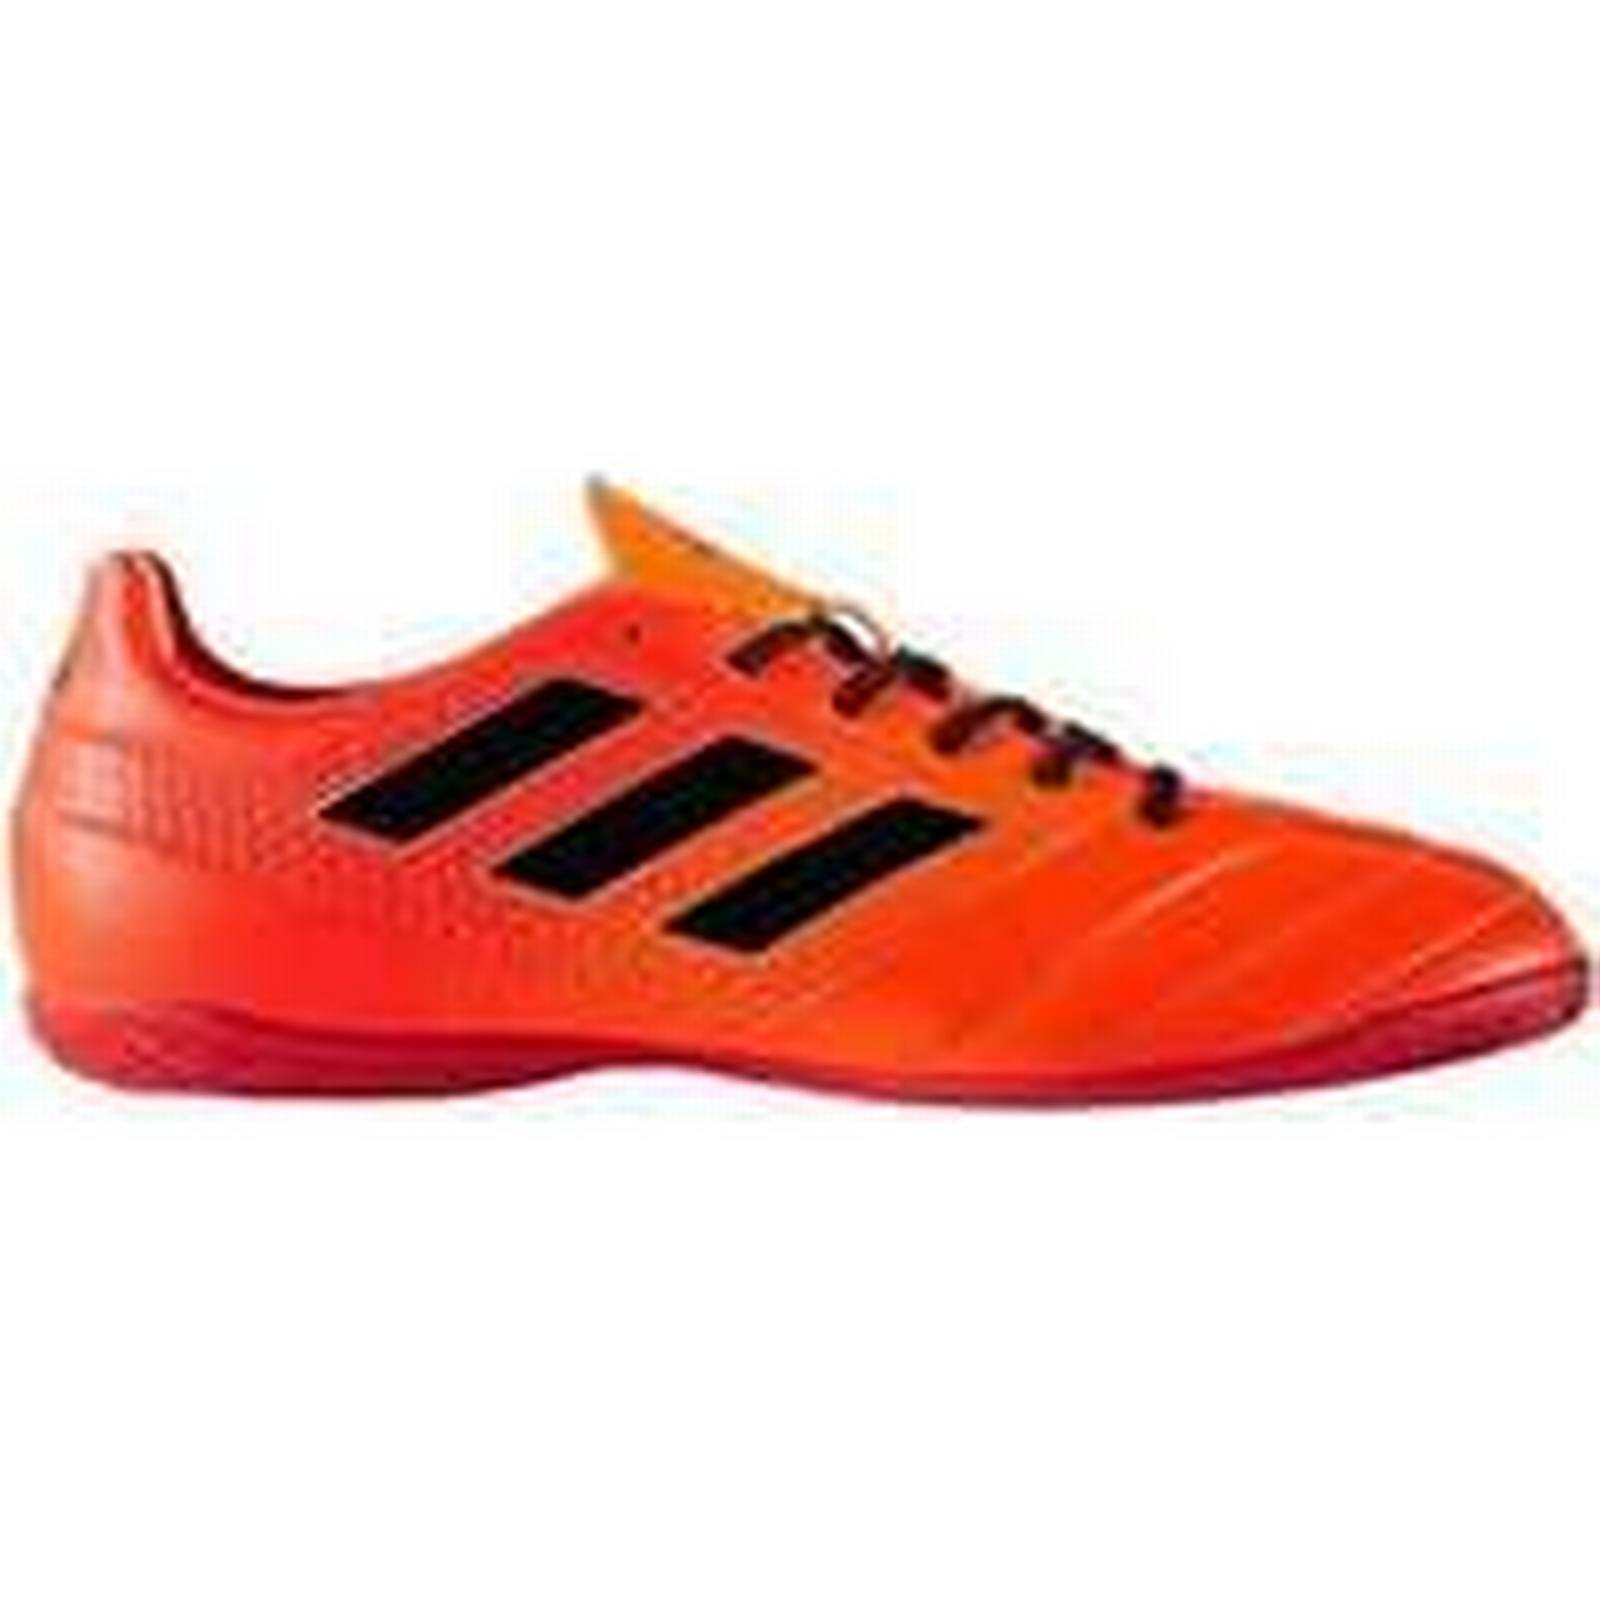 Spartoo.co.uk adidas Ace 174 IN Pyro Storm Orange men's Shoes (Trainers) in Orange Storm c9d9c6